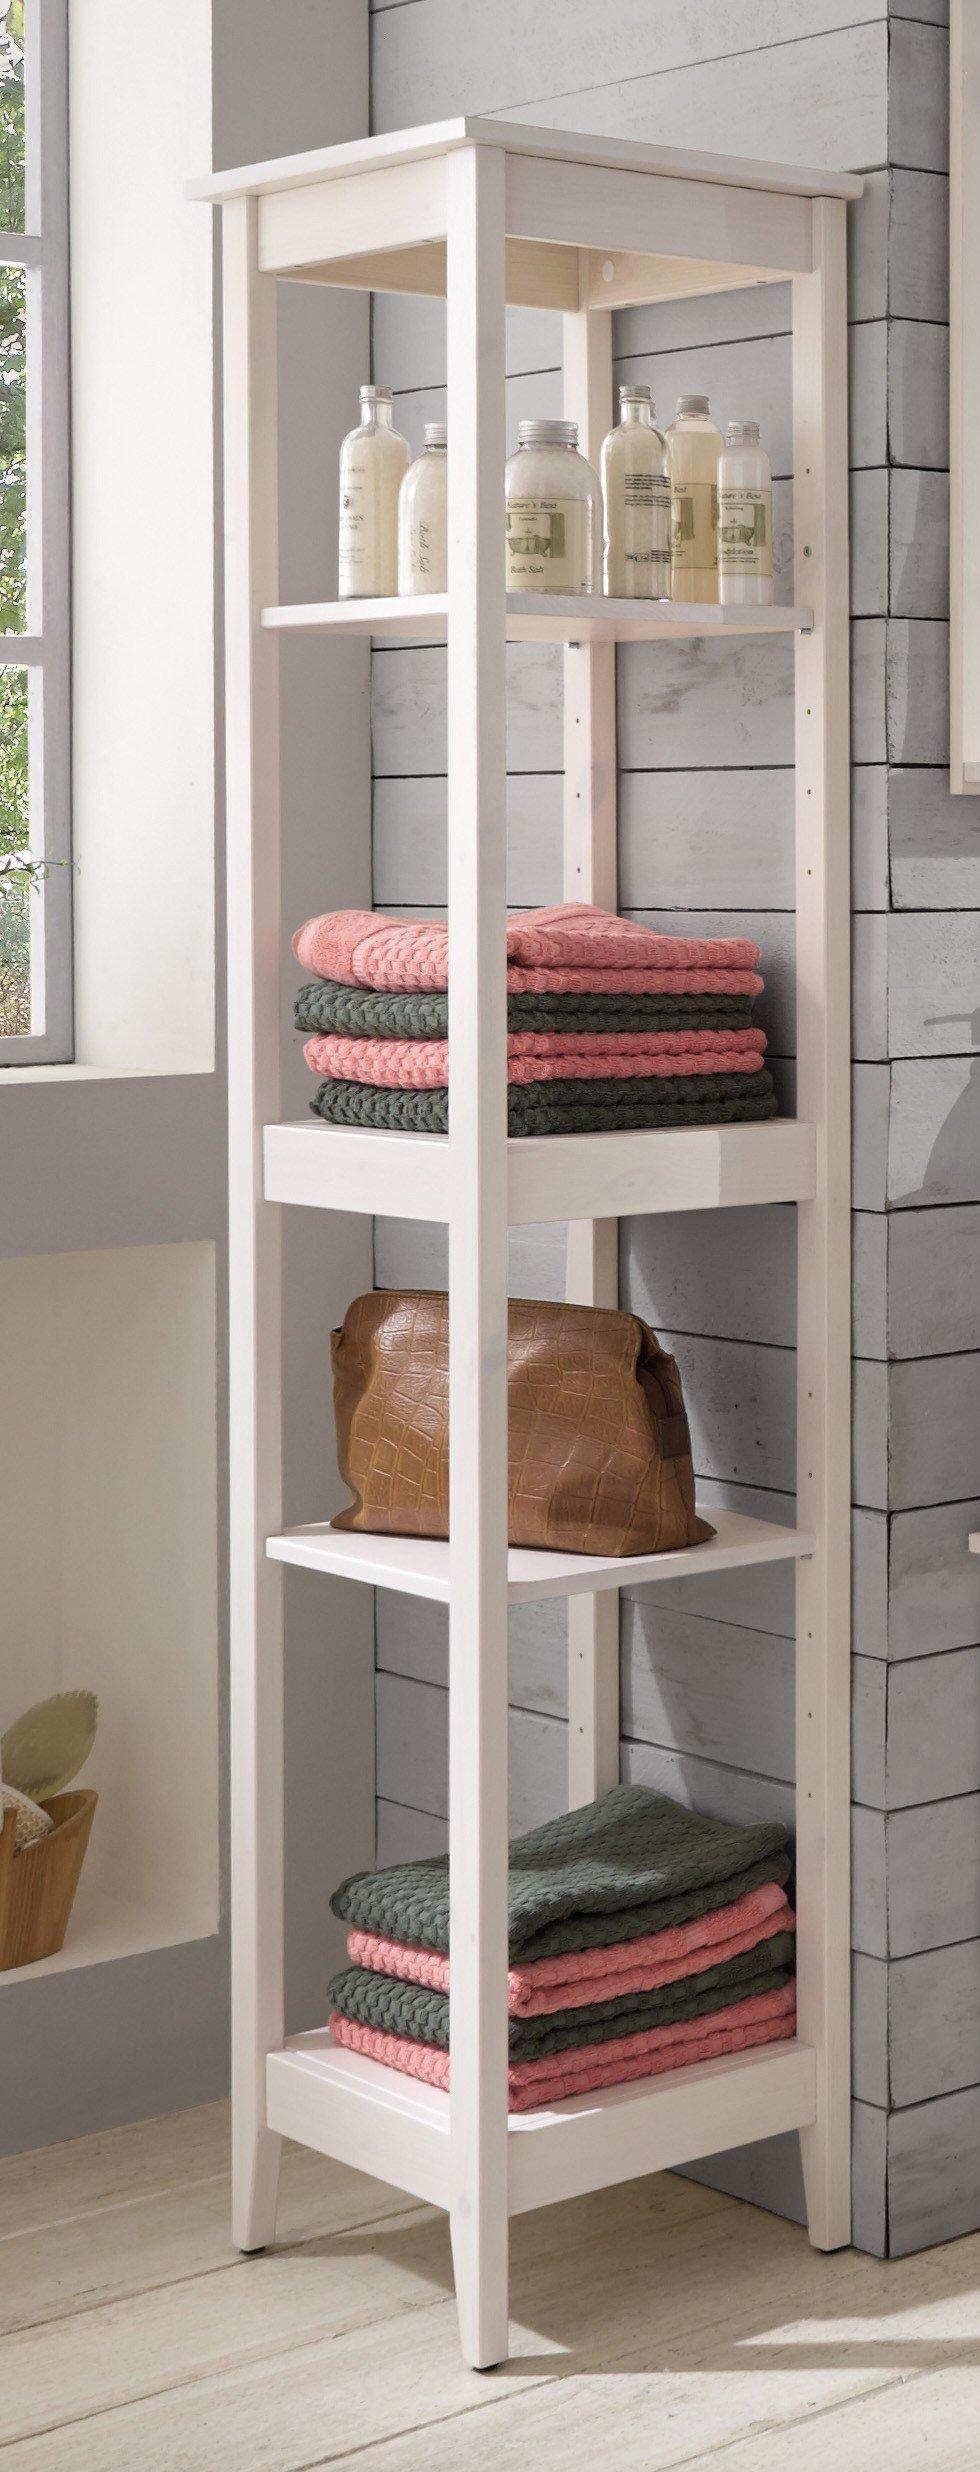 pure natur badezimmer kjell kiefer wei m bel letz ihr online shop. Black Bedroom Furniture Sets. Home Design Ideas